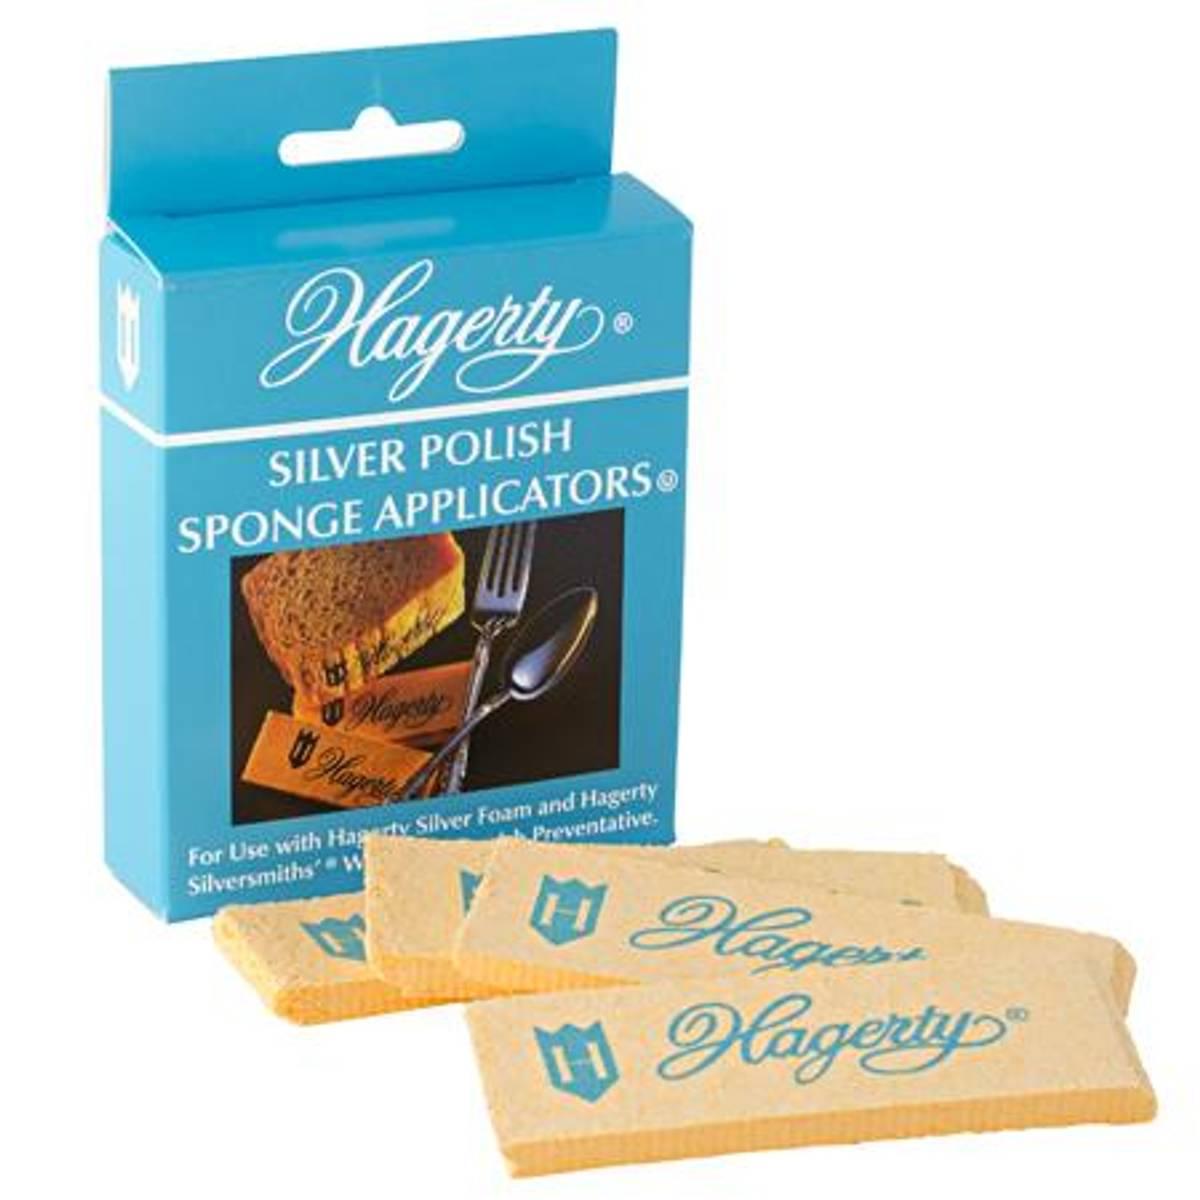 Hagerty svamper for sølvpuss